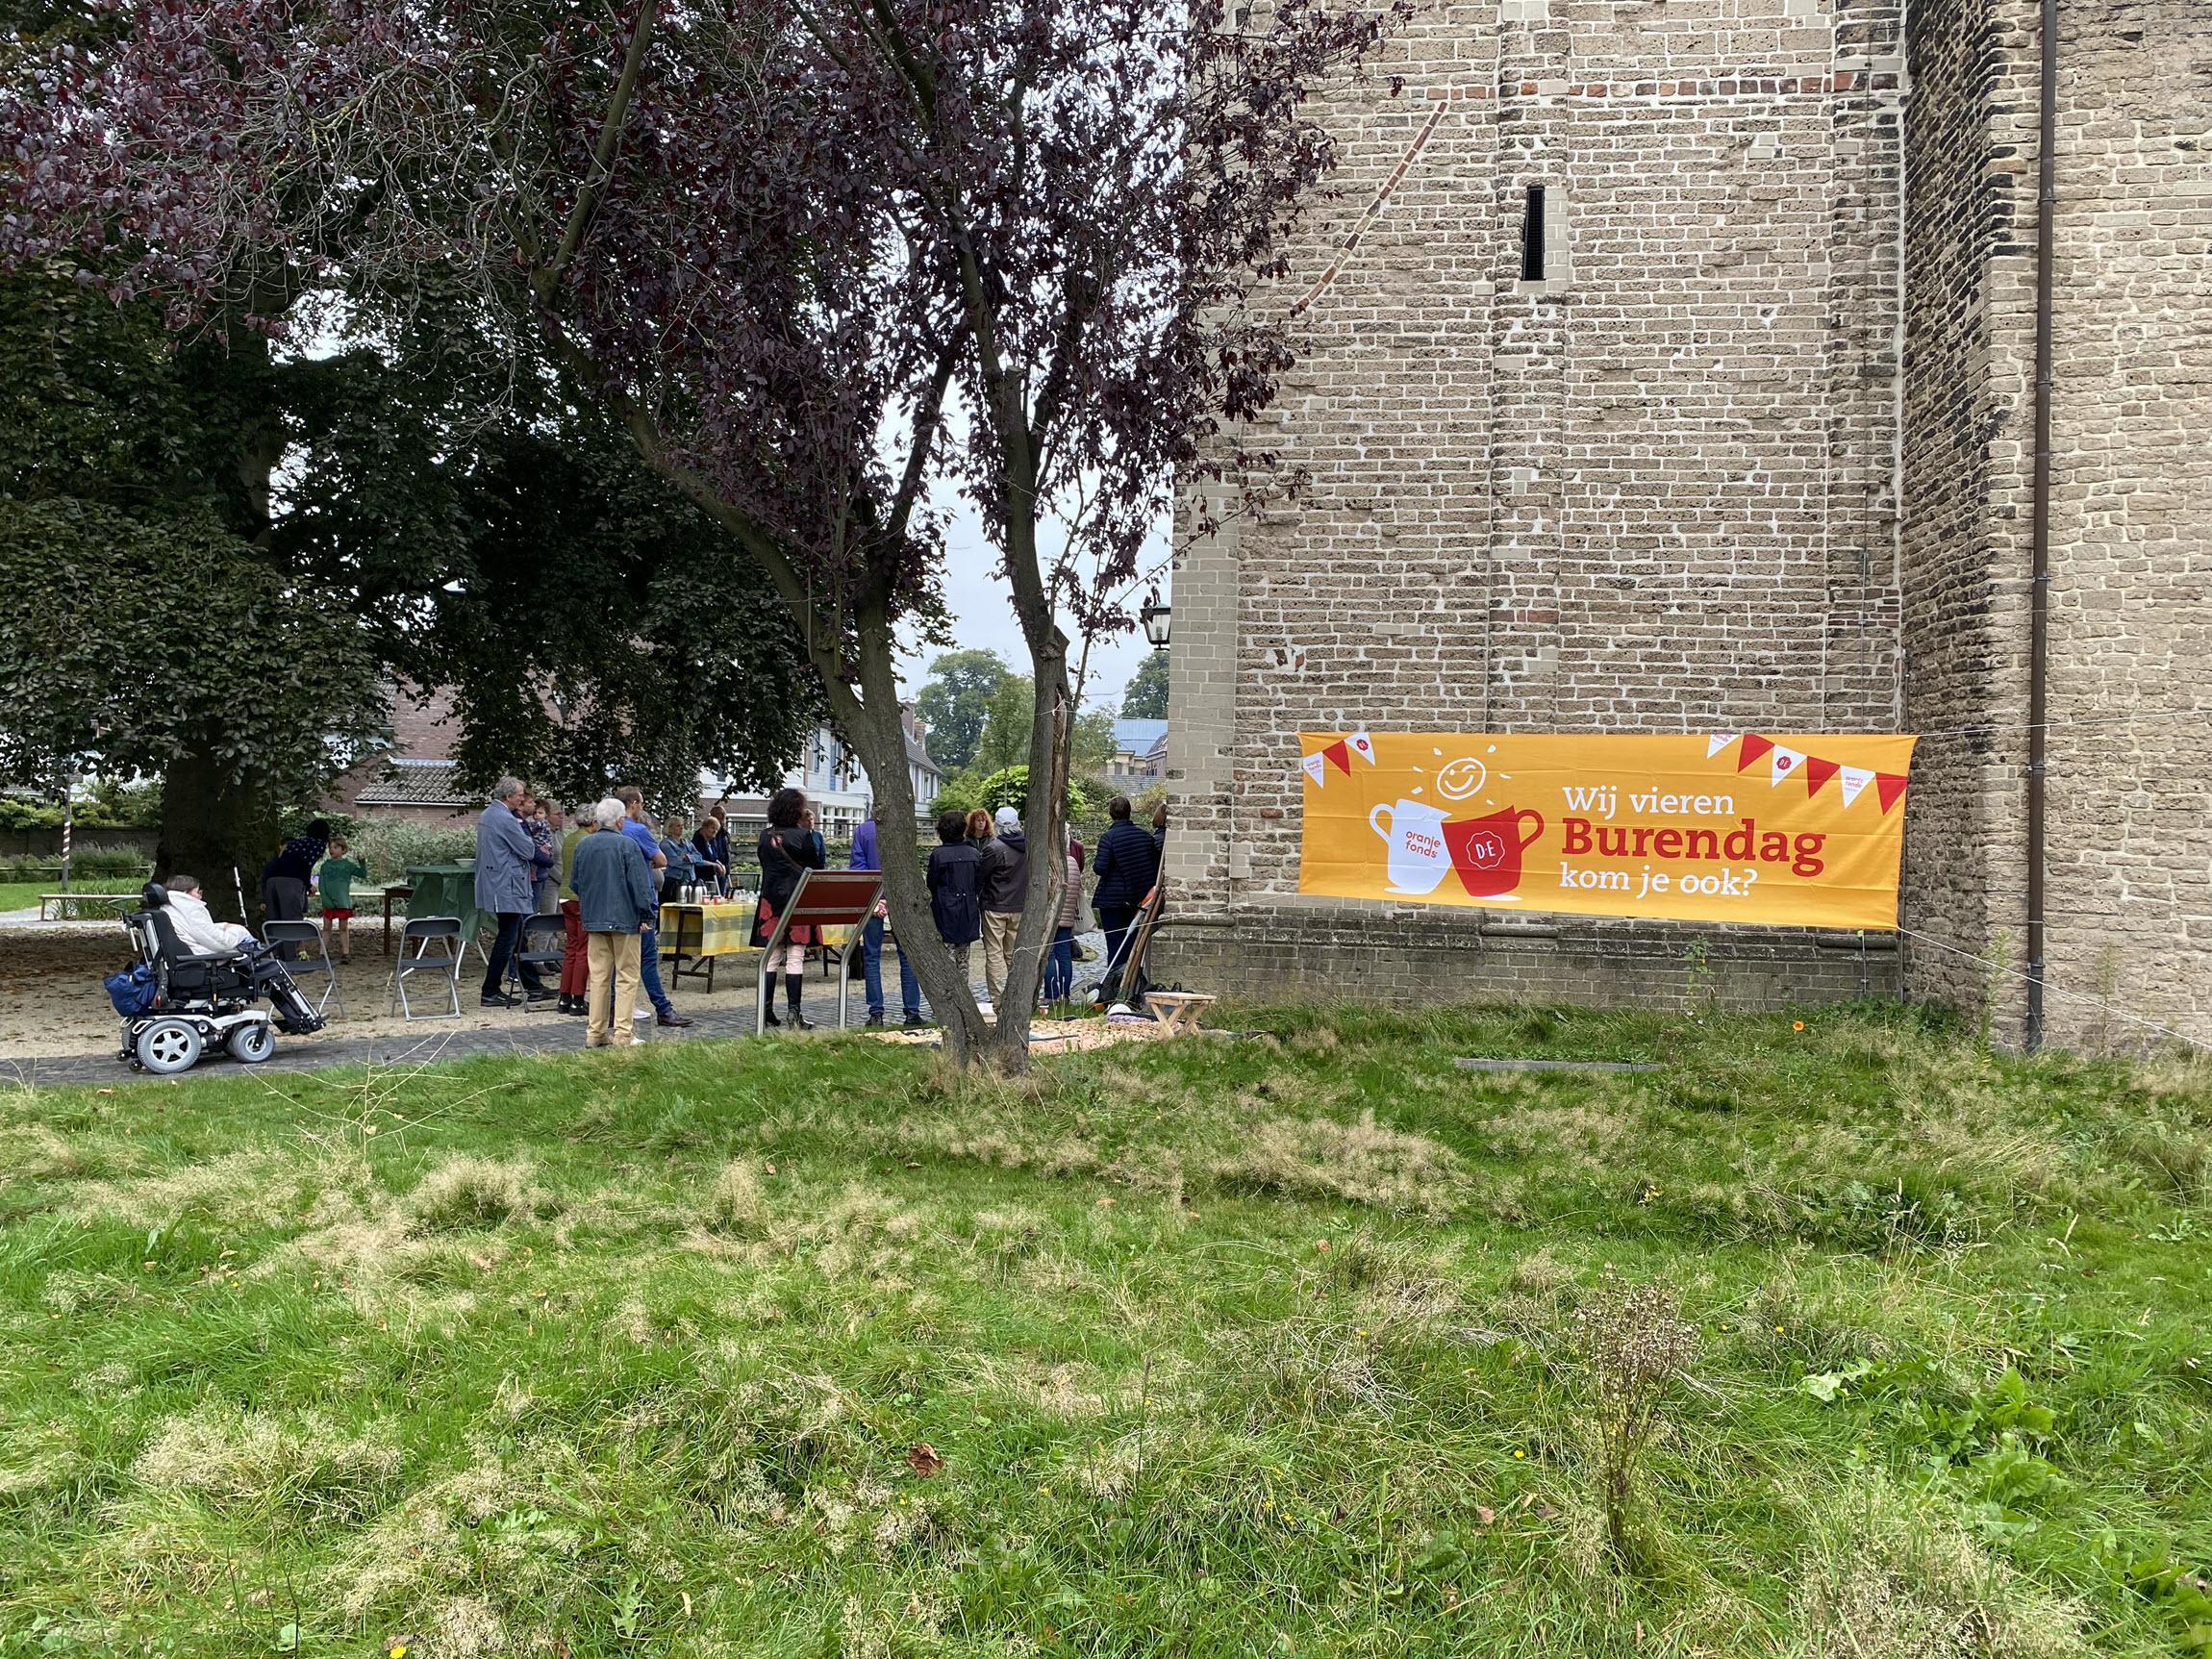 2021-09-25 Burendag Oude Jan Velp groot succes!